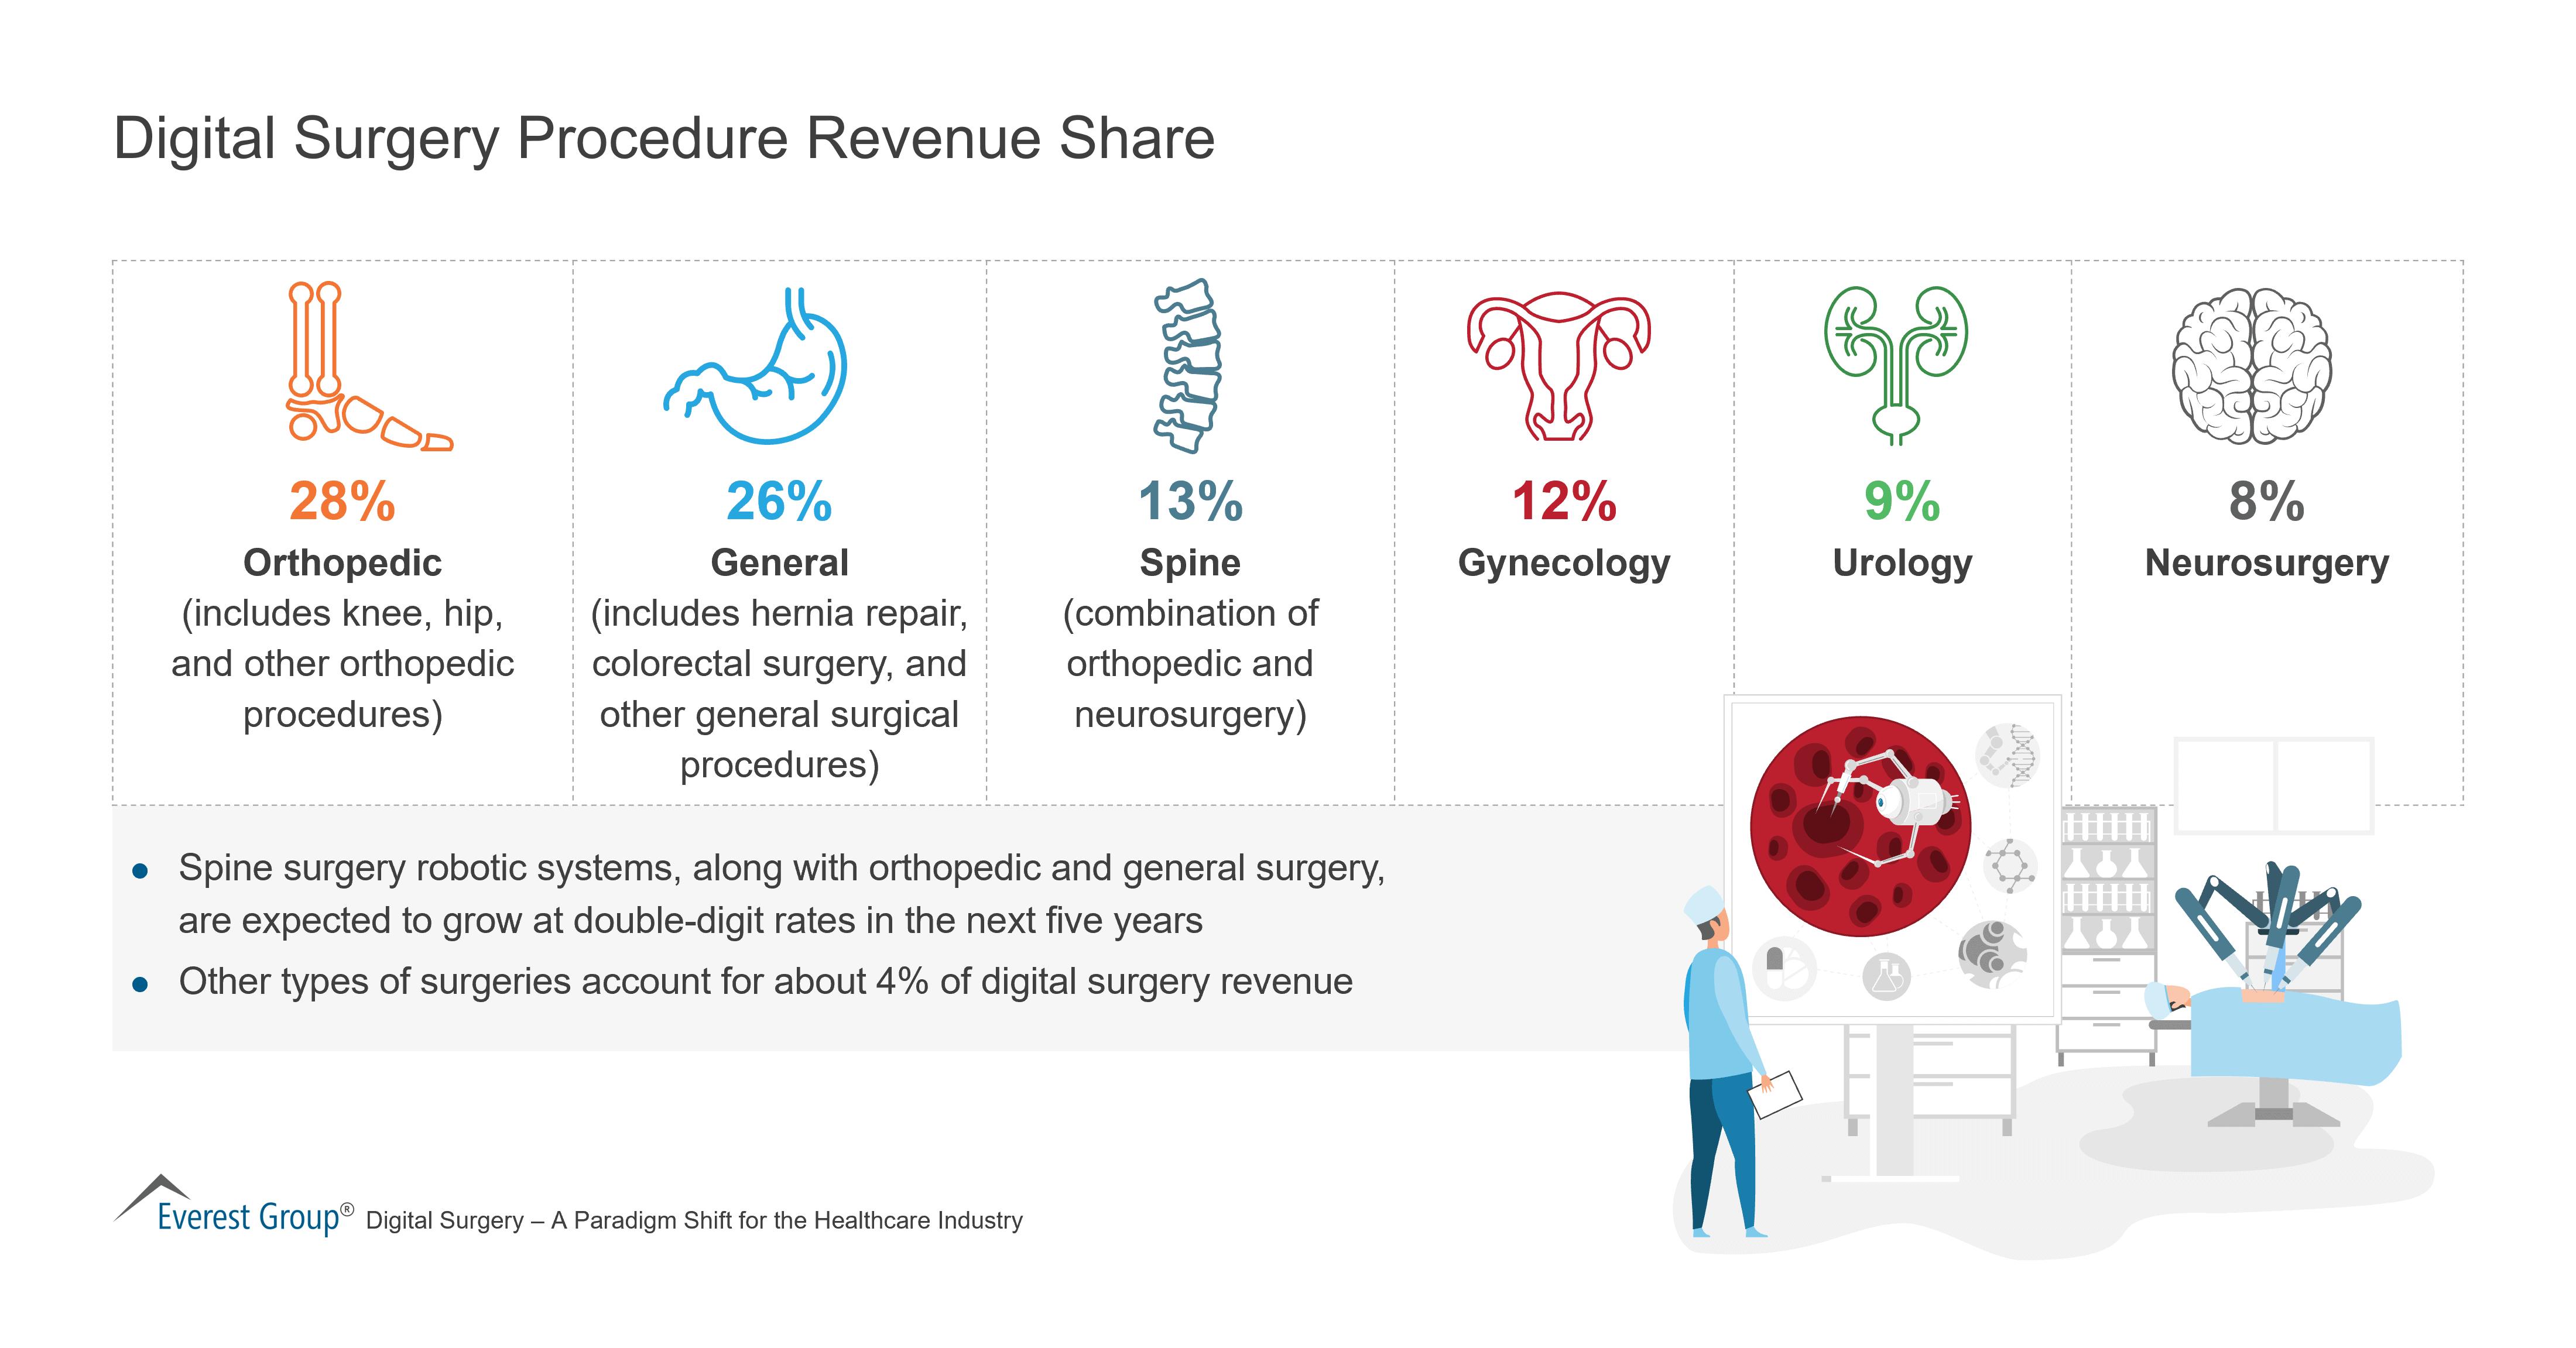 Digital Surgery Procedure Revenue Share